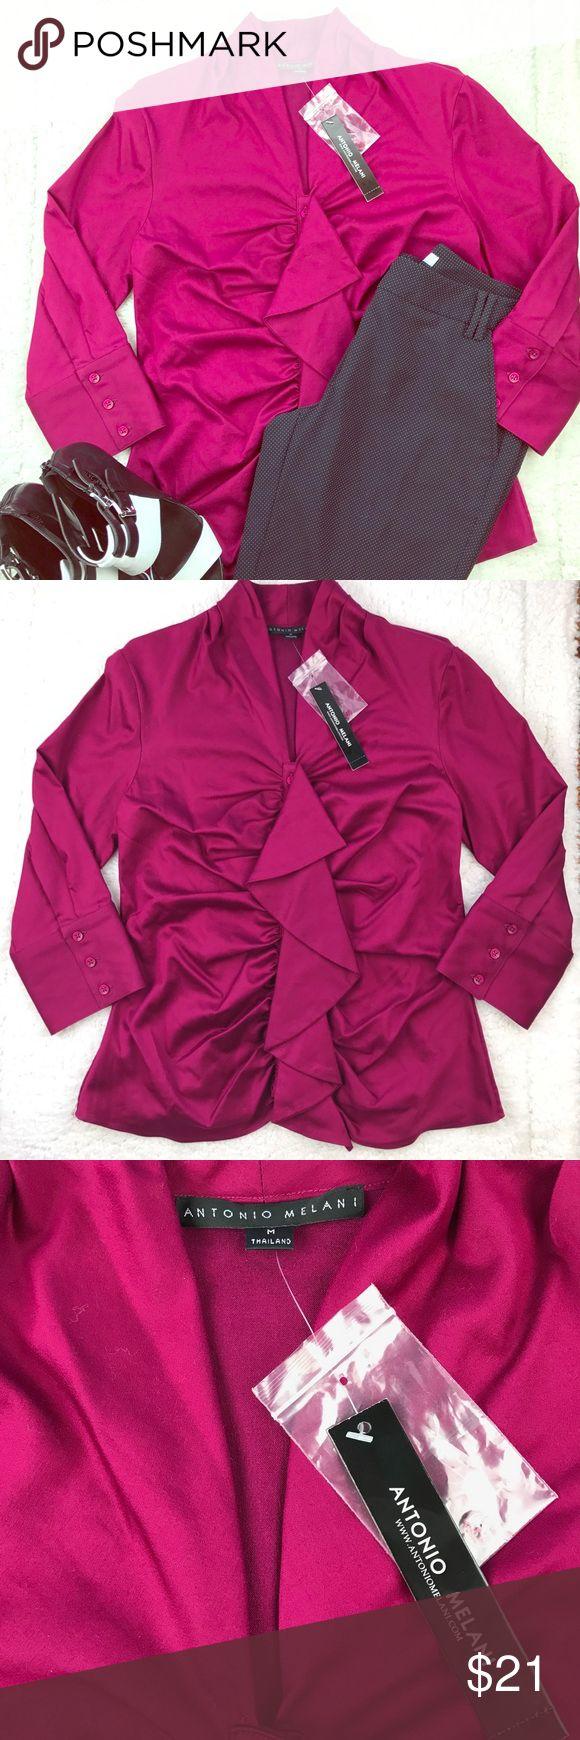 Antonio Melani burgundy too Antonio Melani burgundy top/beautiful 💕/ in size M Tops Blouses